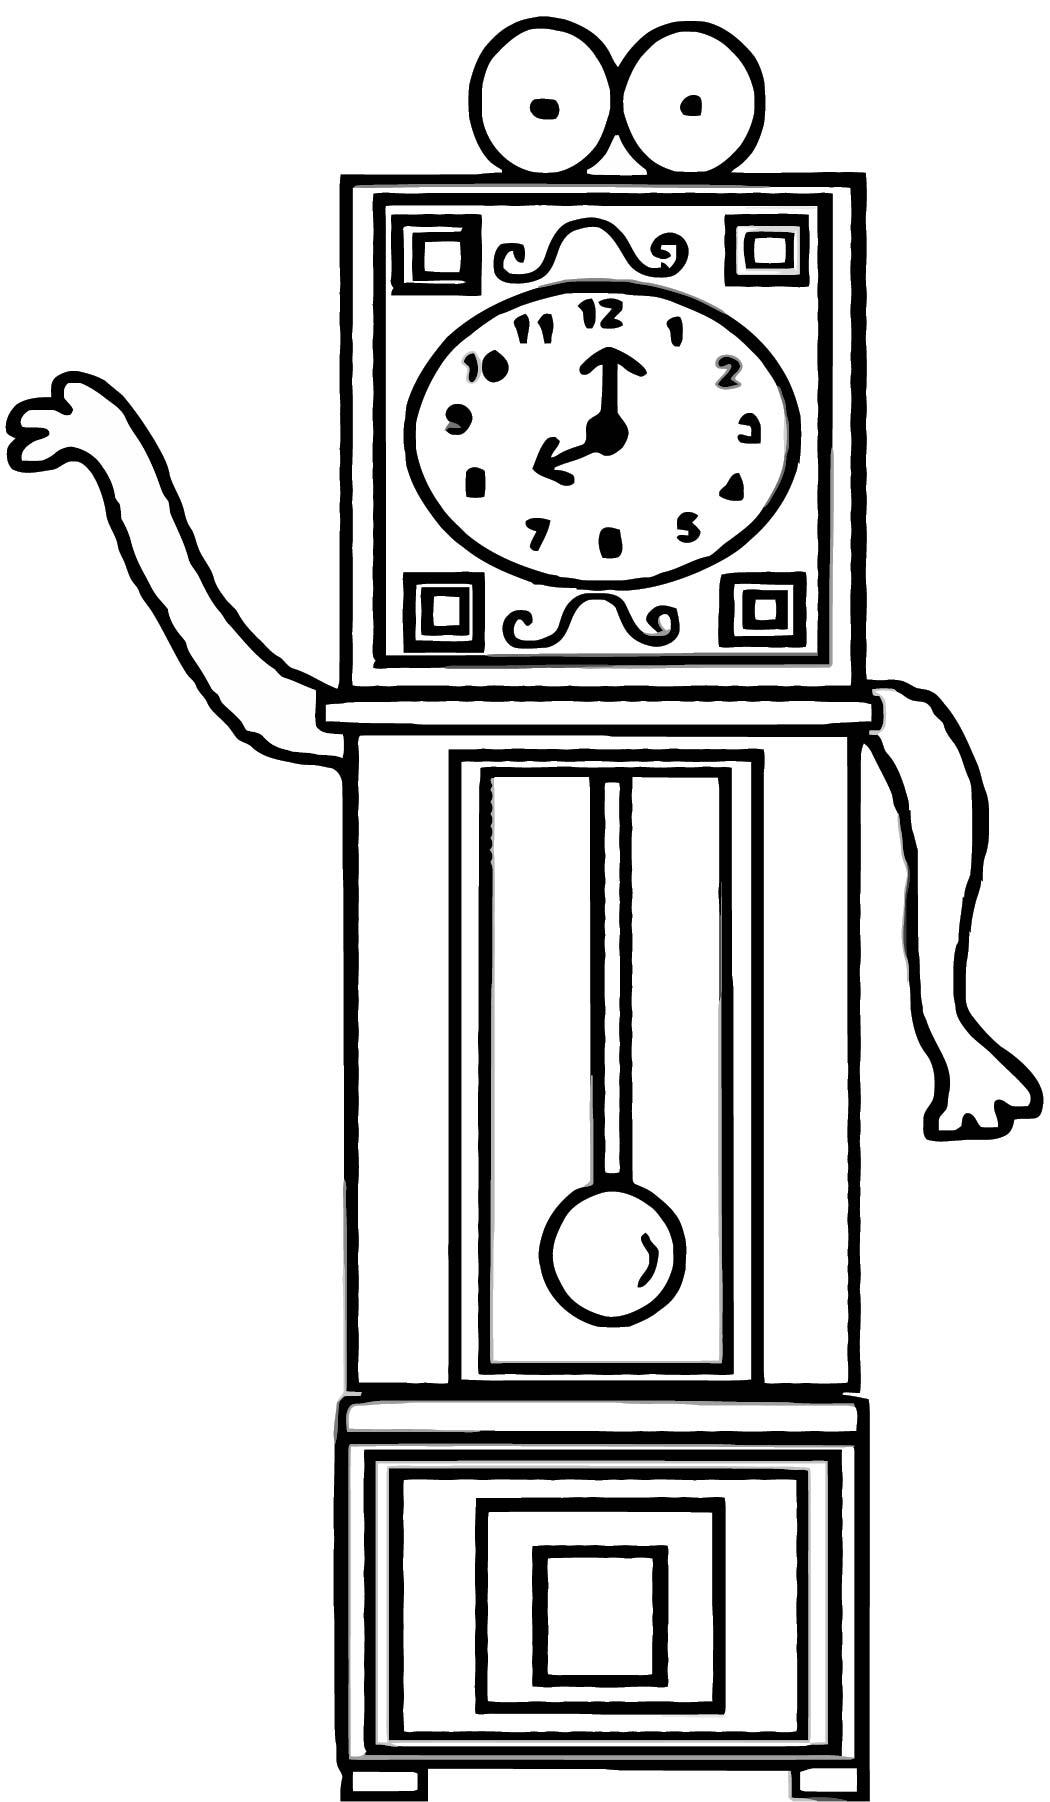 Daylight Savings Time Clock Clipart Free Printable 2 Cartoonized Free Printable Coloring Page